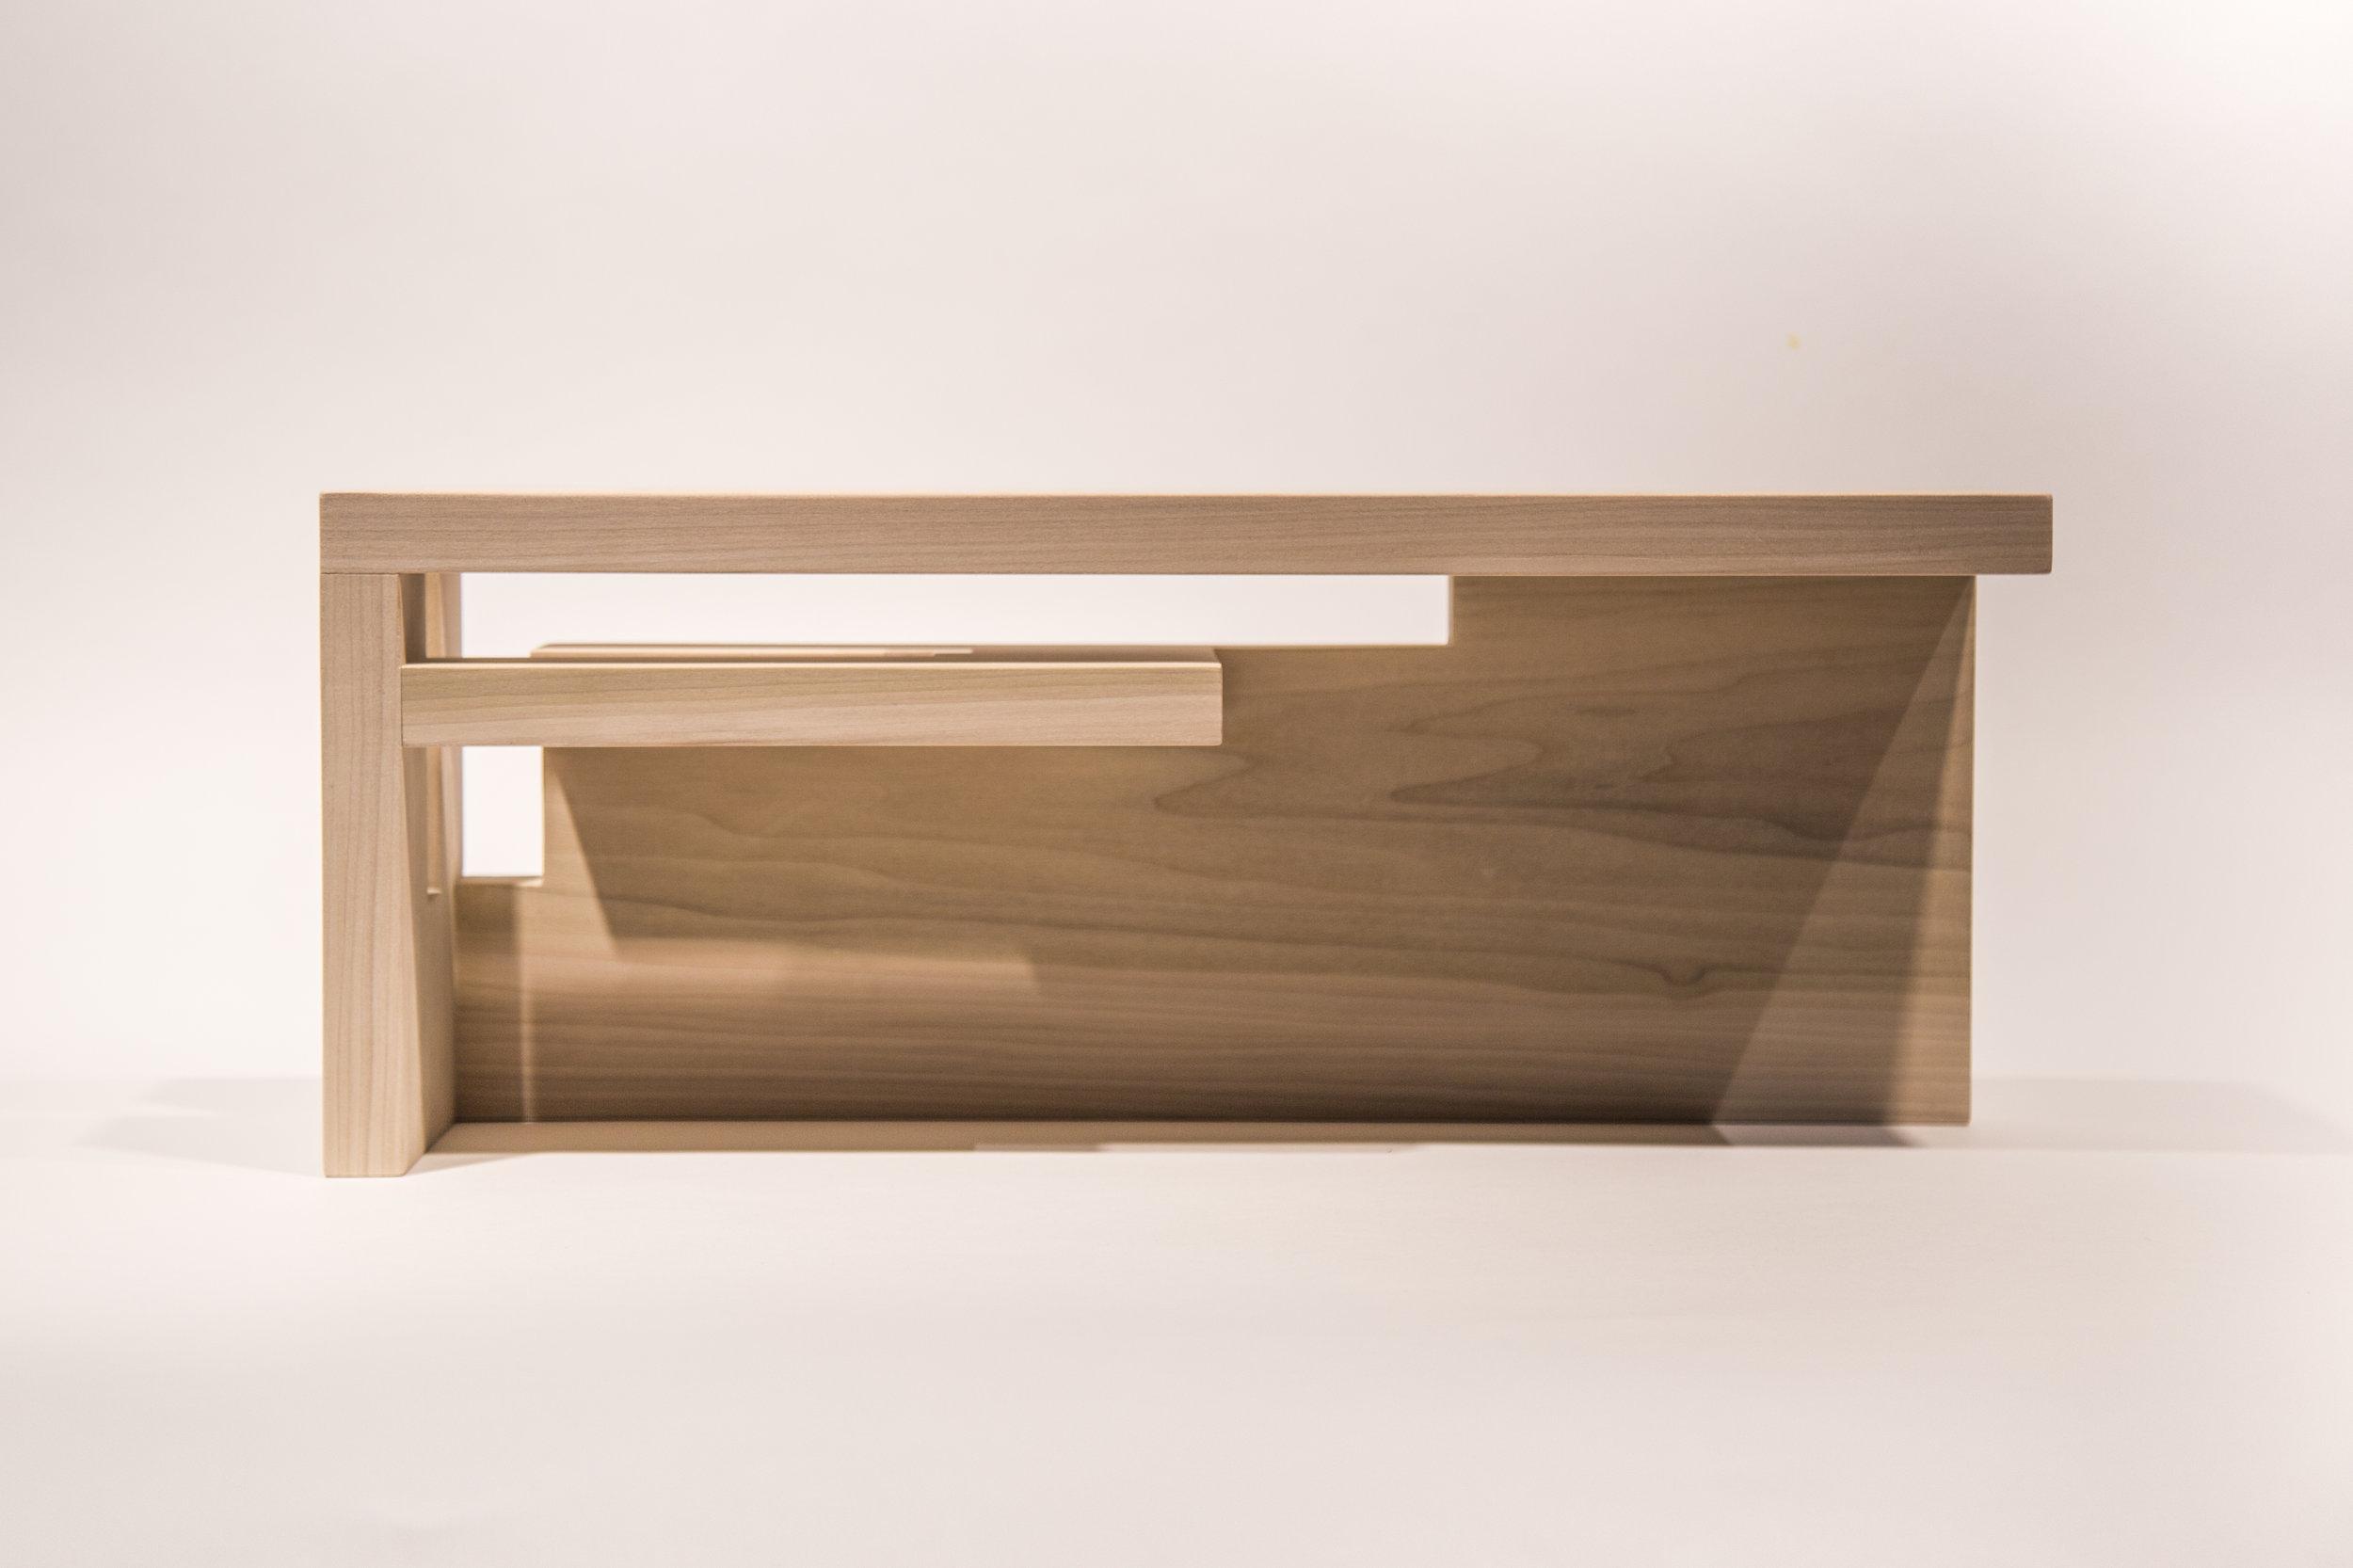 2_Tableshelf.jpg